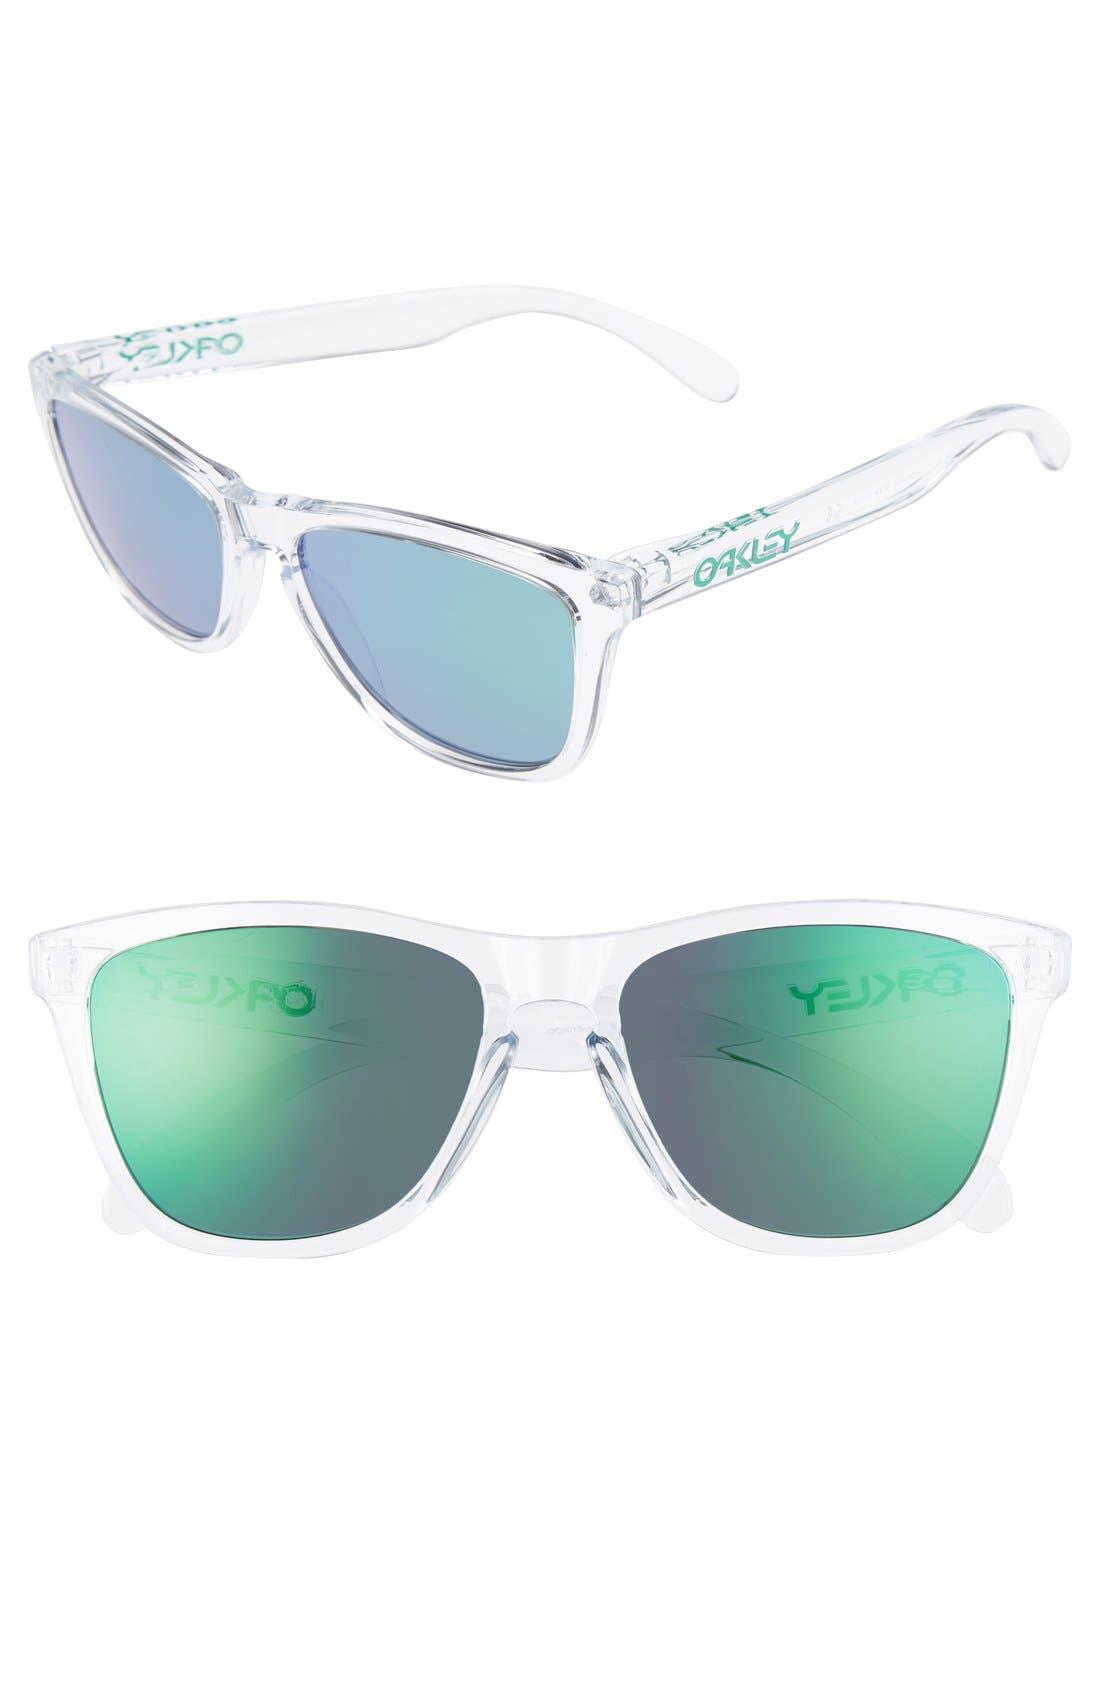 Main Image - Oakley Frogskins® 55mm Sunglasses